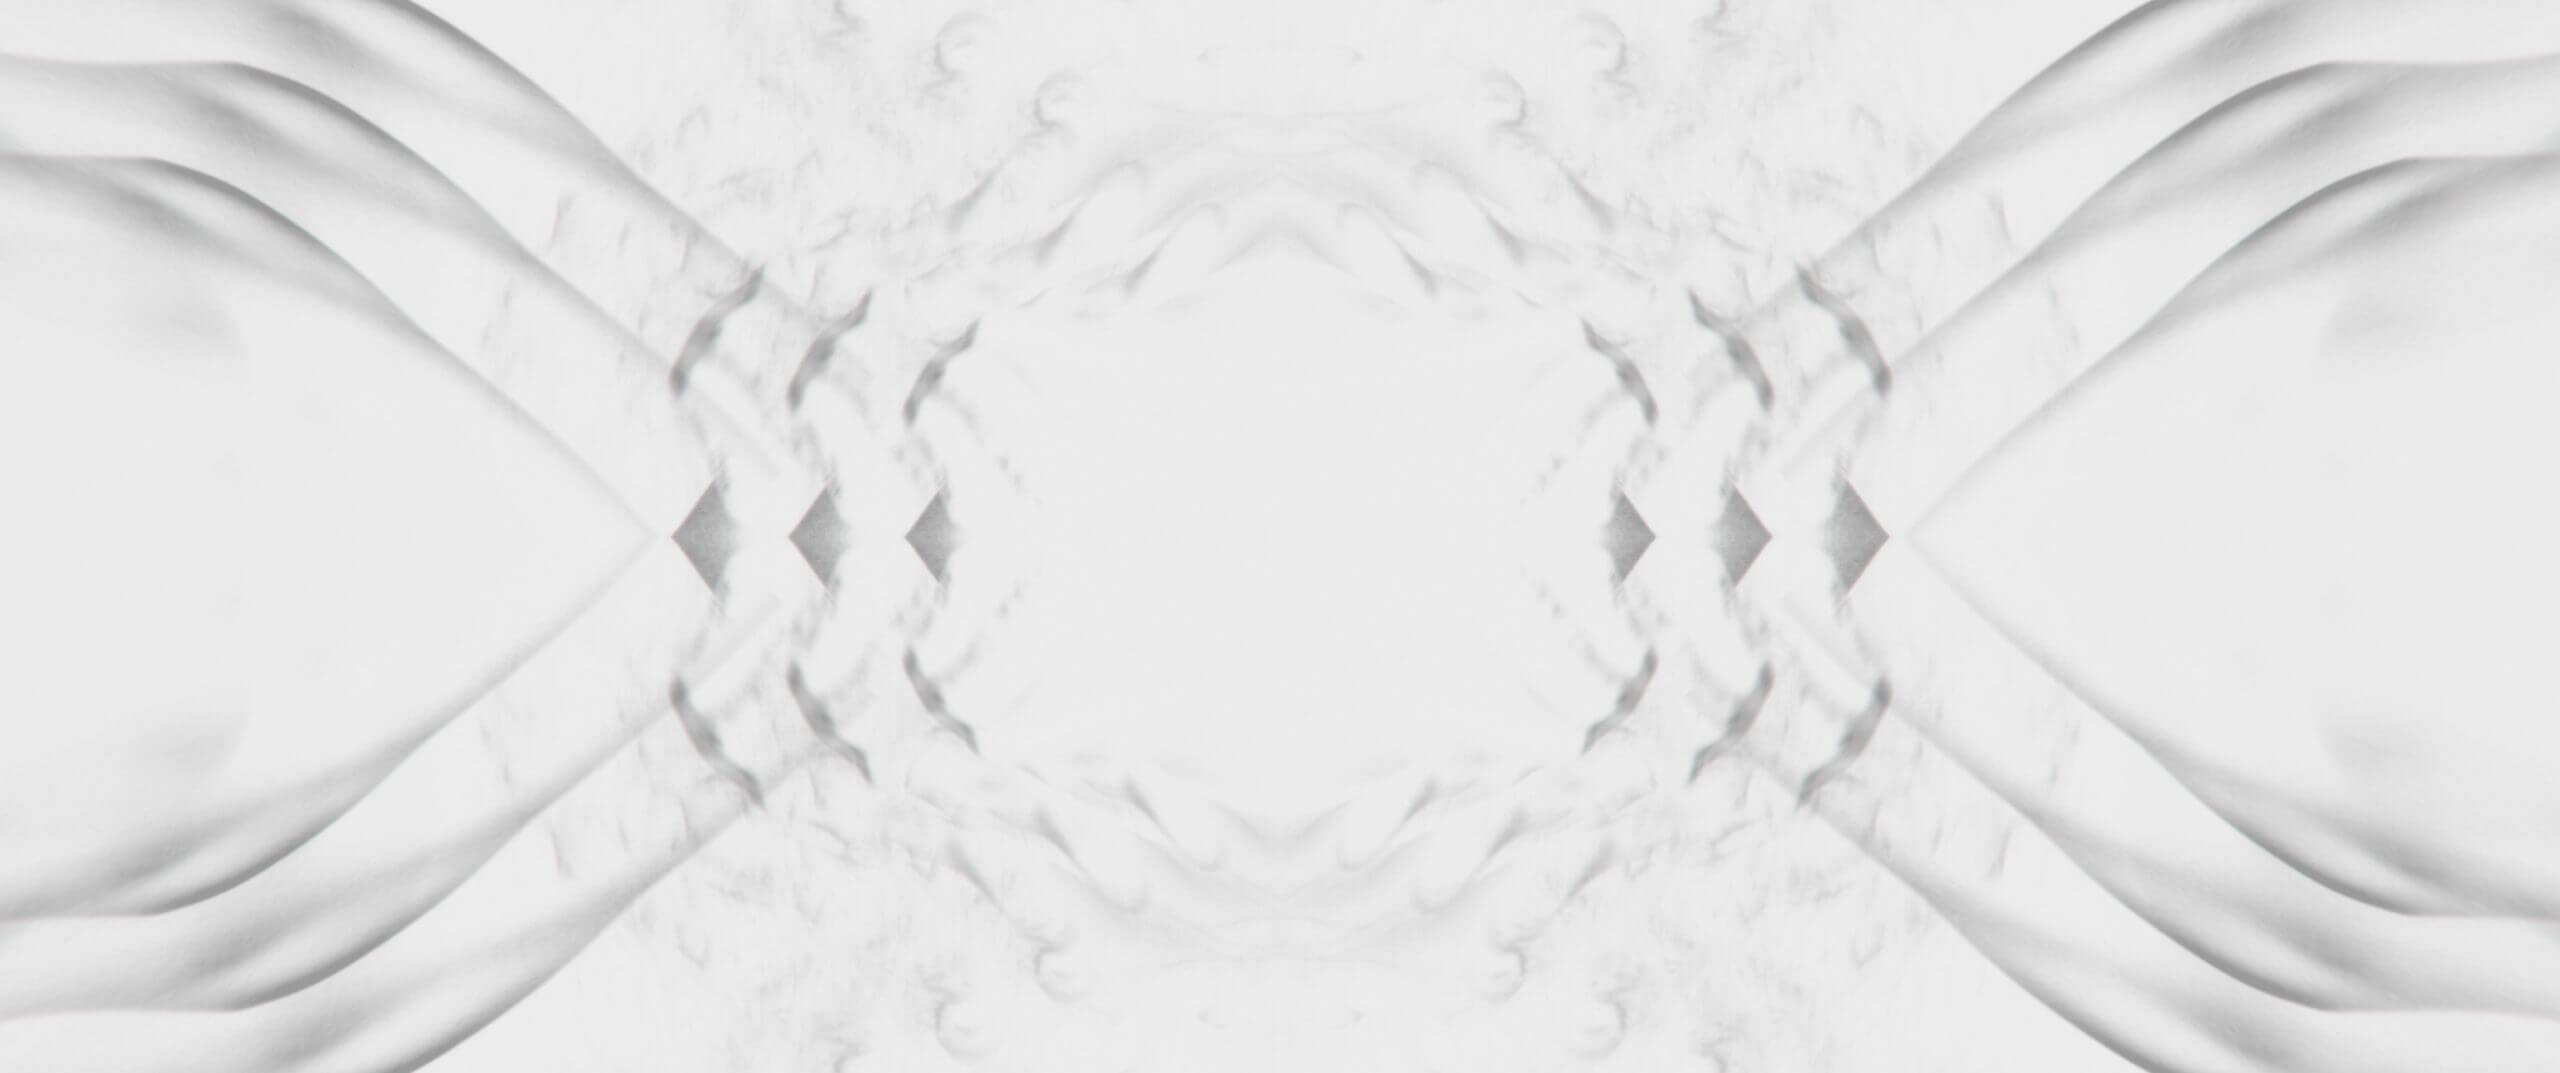 Echo_Exploration04_02